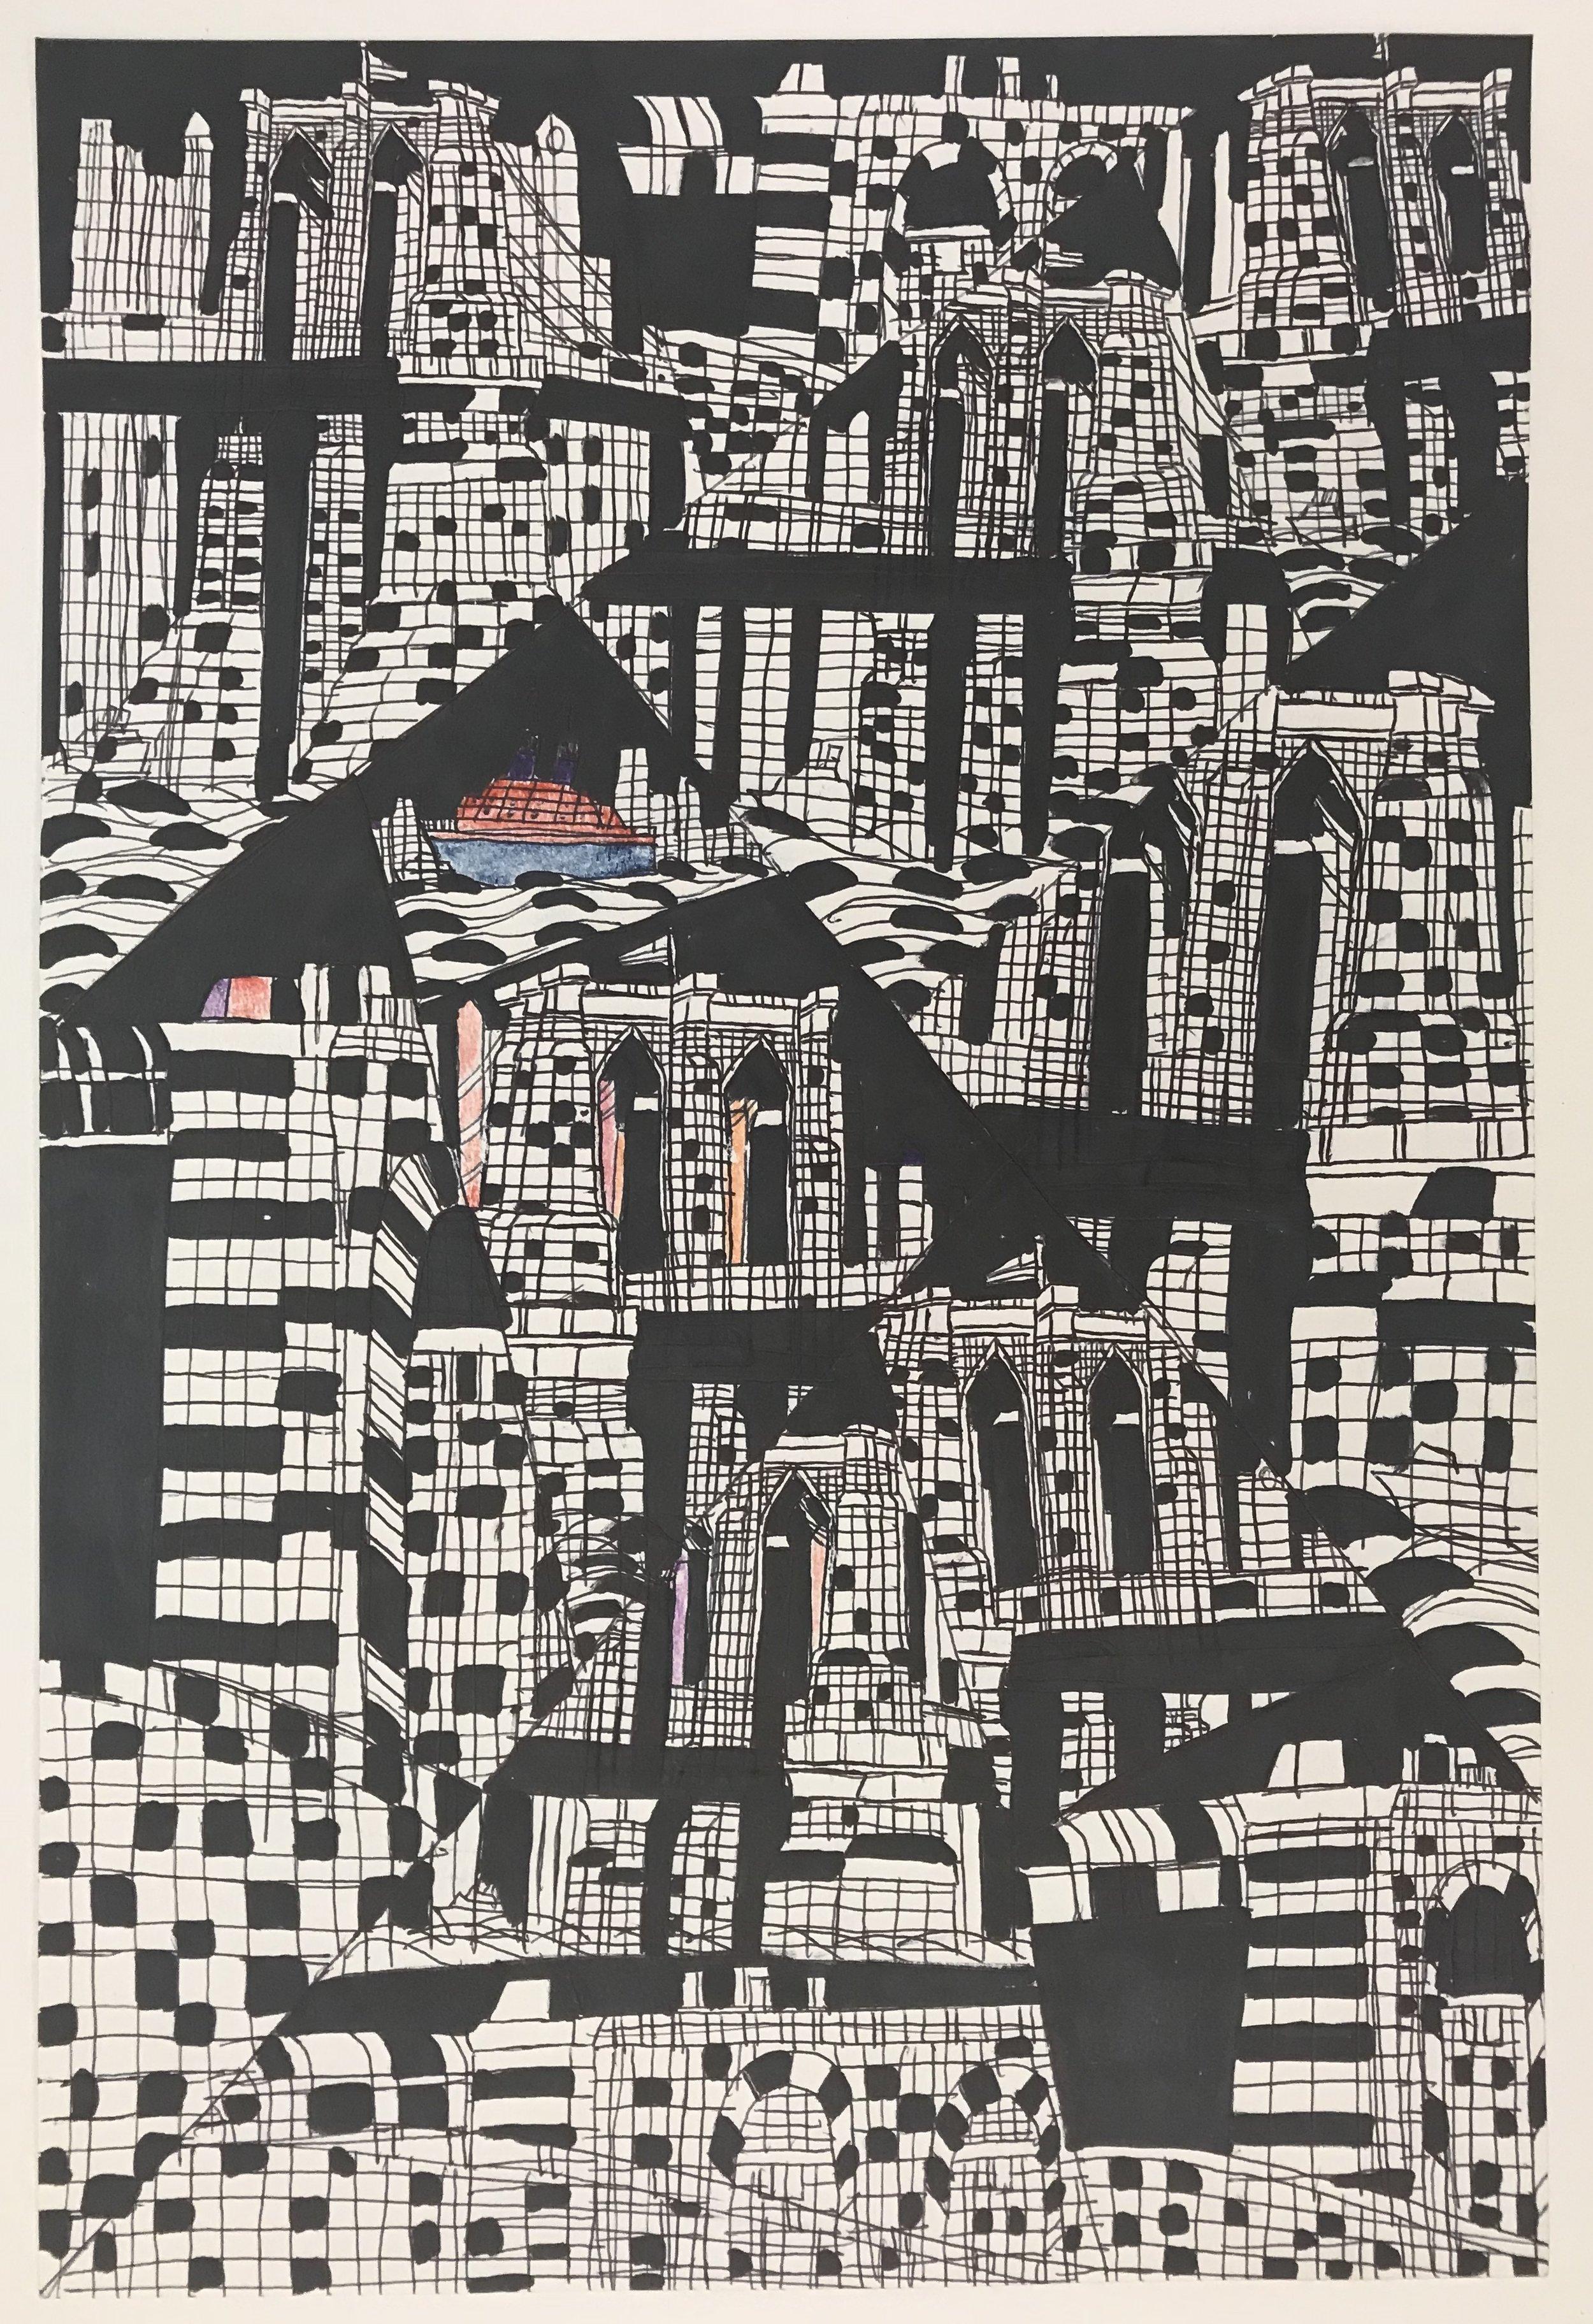 RL017_Robert_Latchman__Black_and_White_Bricks__2018__Mixed_media_on_paper__18.25_x12_.jpg